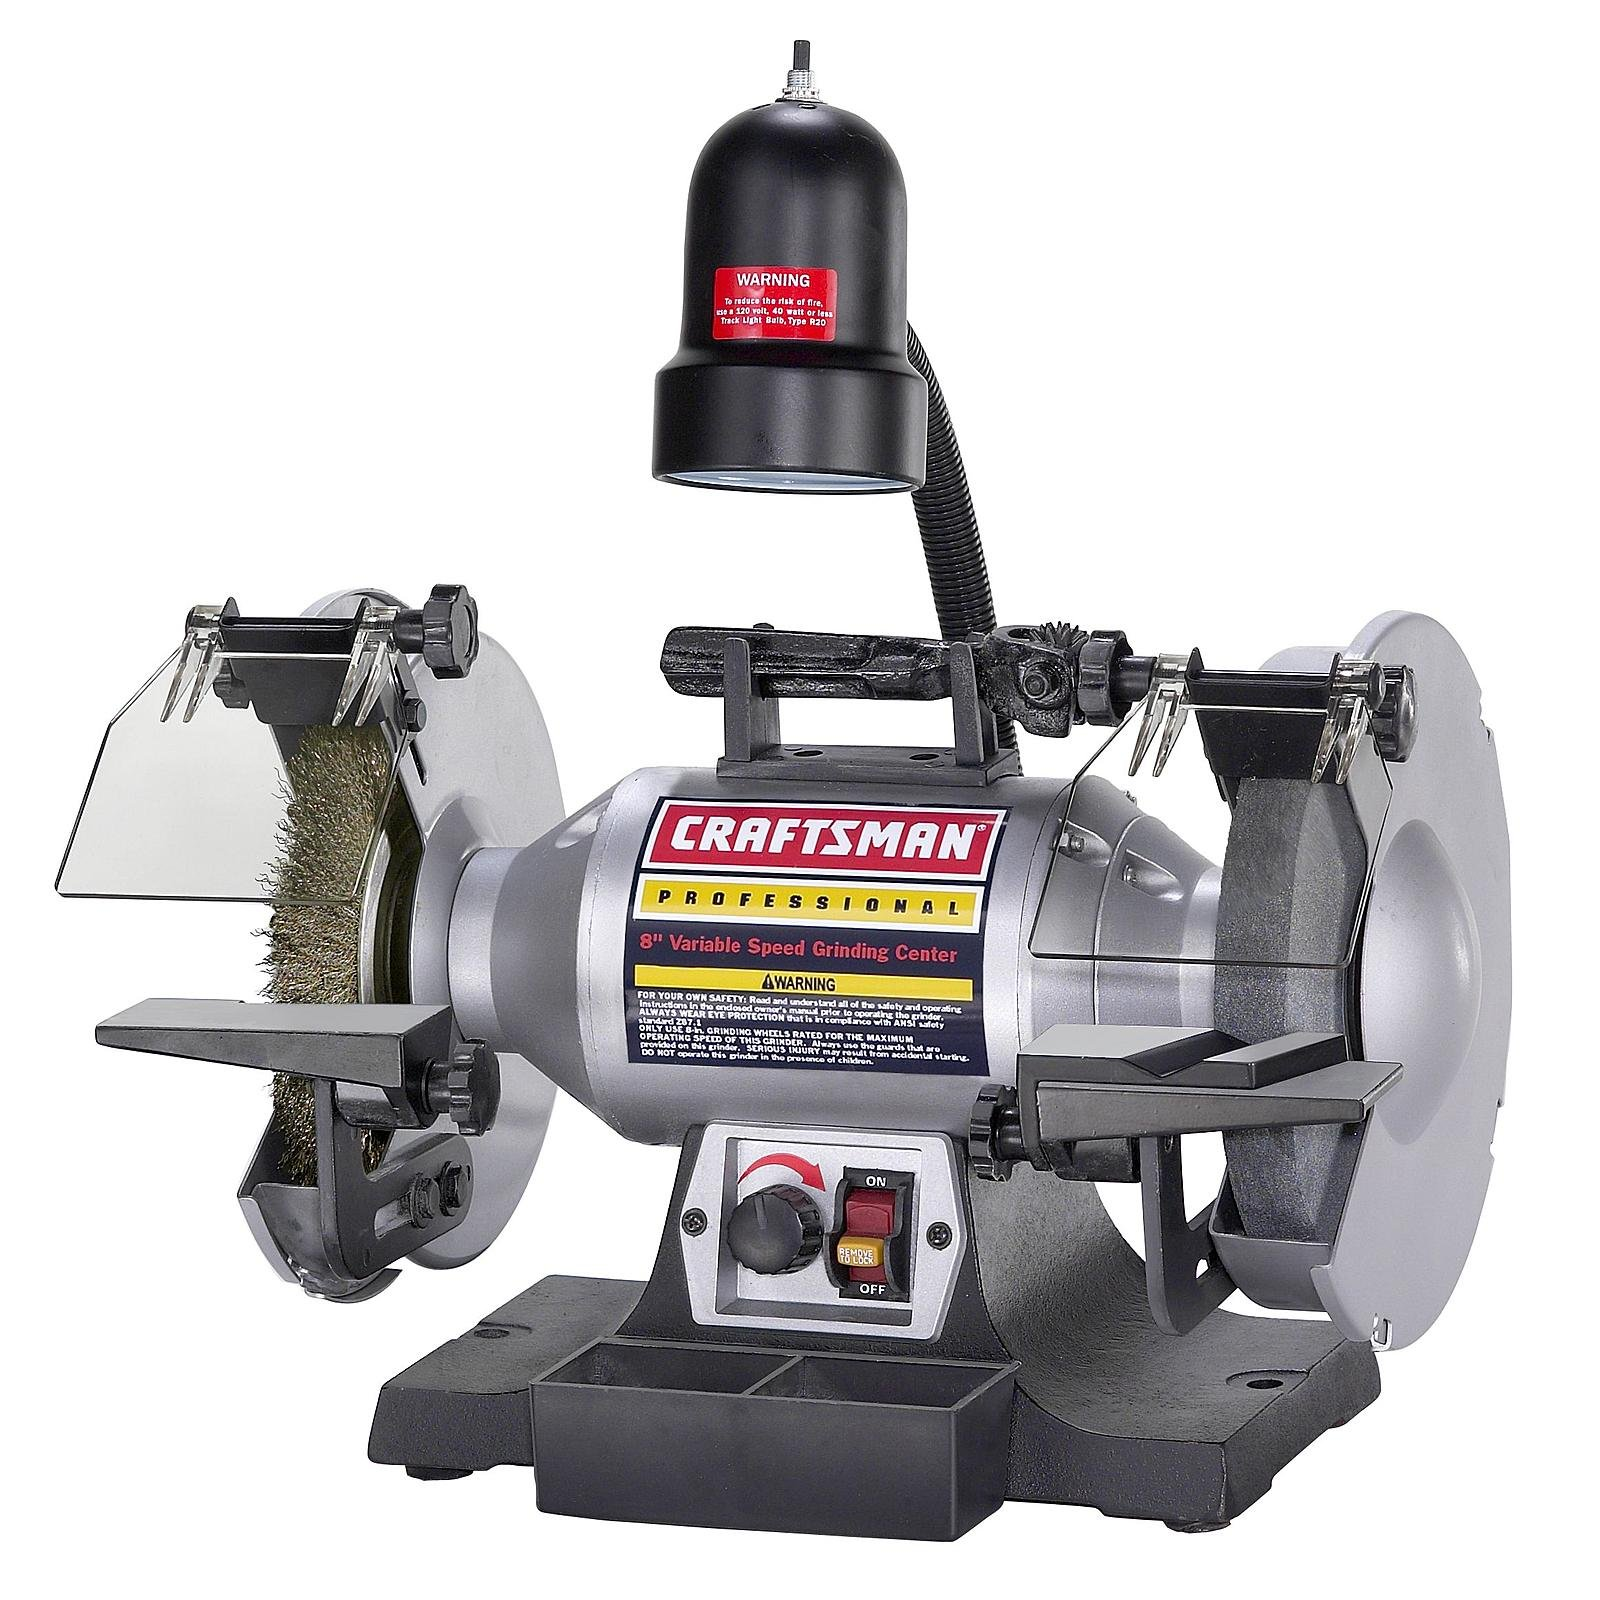 Craftsman Professional Variable Speed 8'' Bench Grinder (21162)